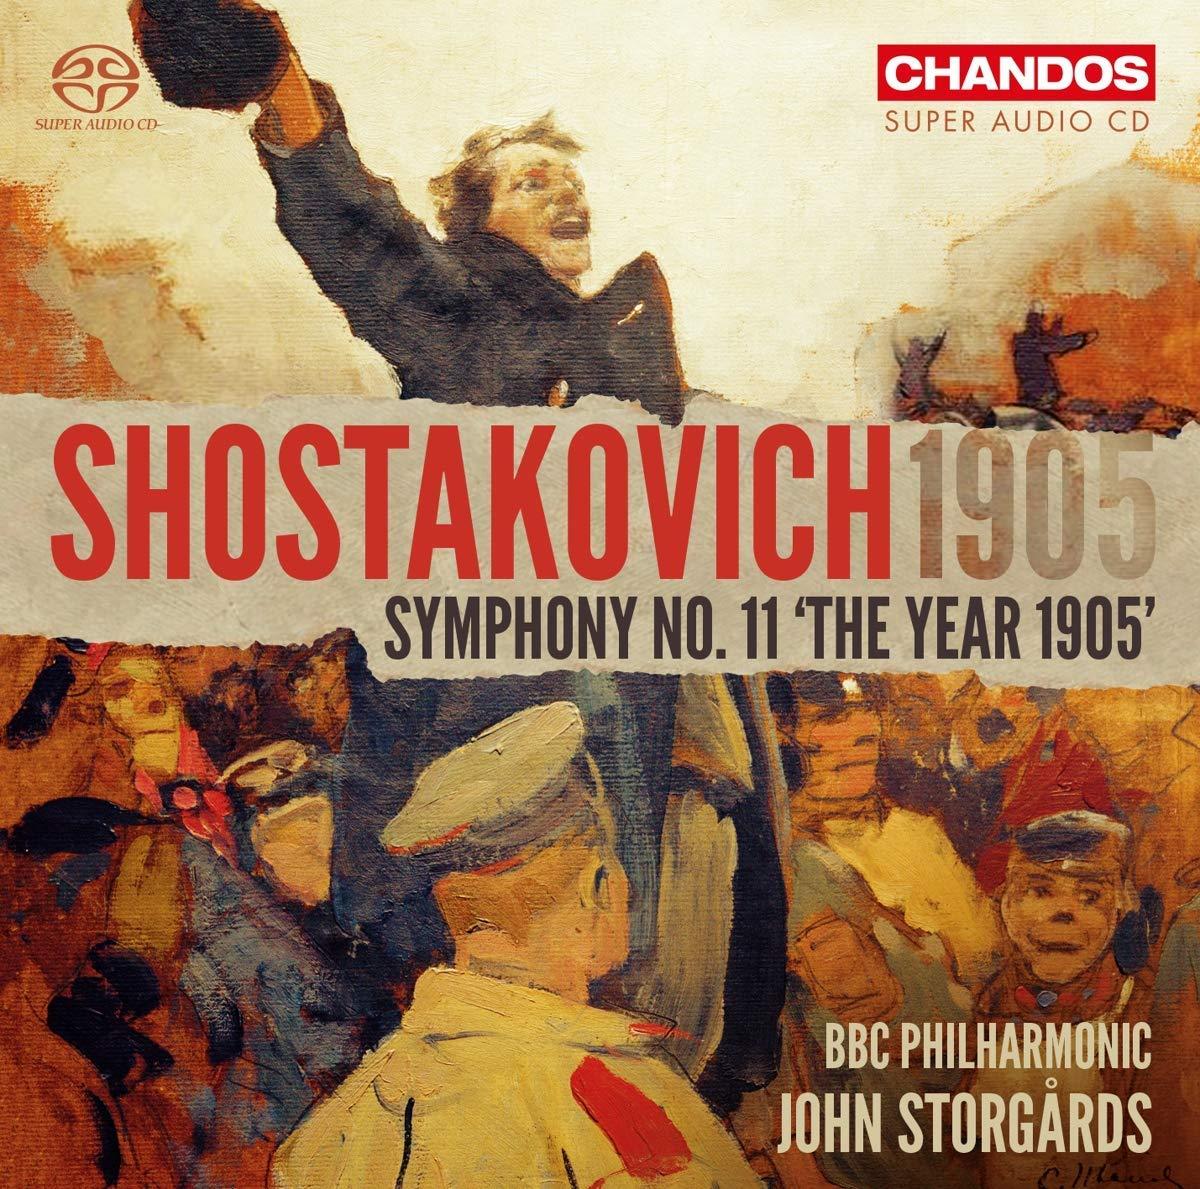 Review of SHOSTAKOVICH Symphony No 11 (Storgårds)